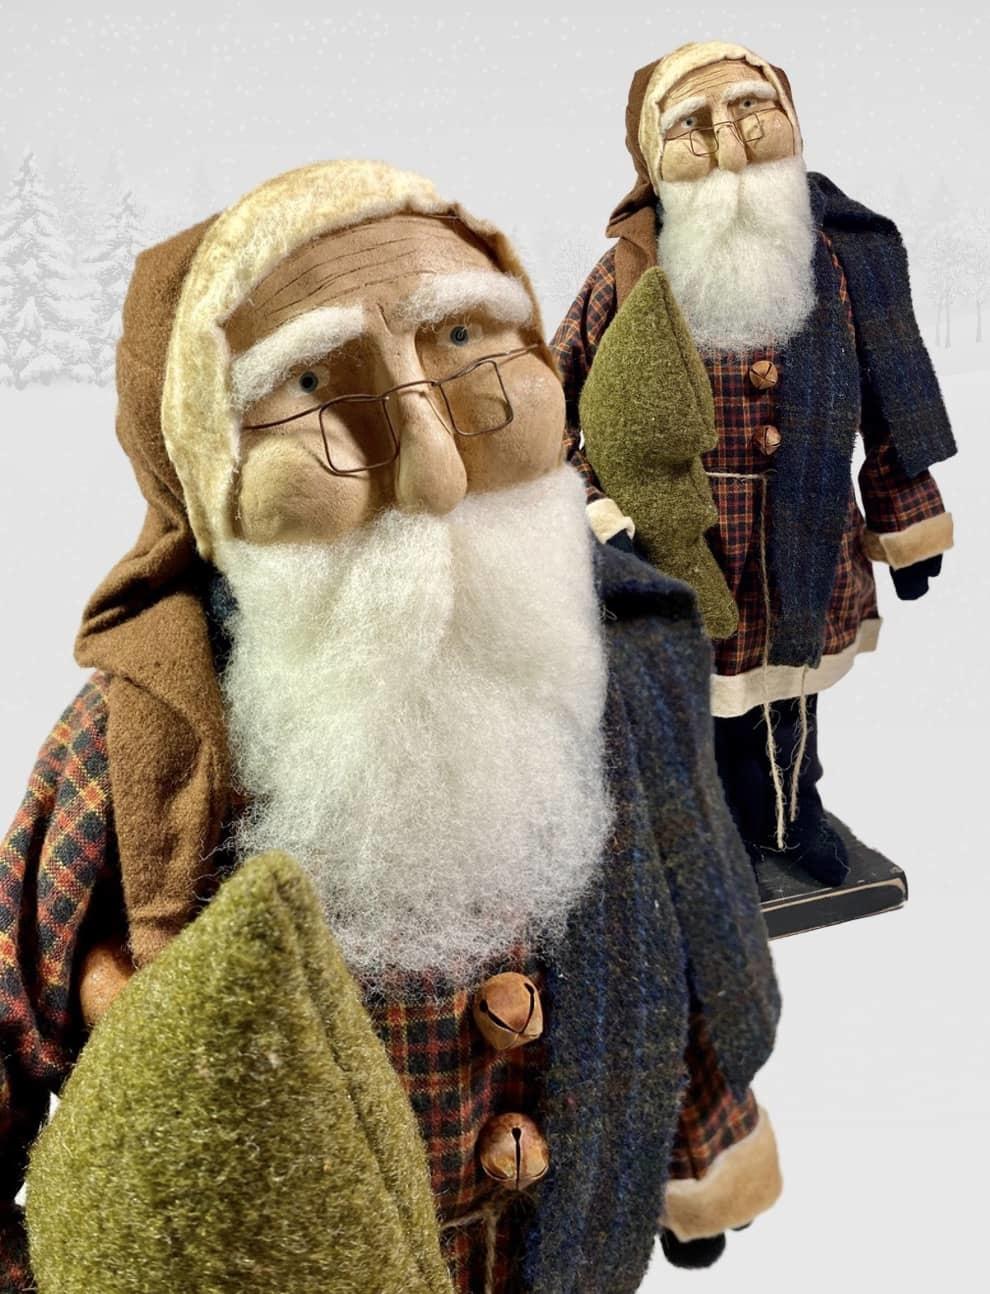 "Nana's Farmhouse Primitive Santa Plaid Coat & Eye Glasses - 17"" T"